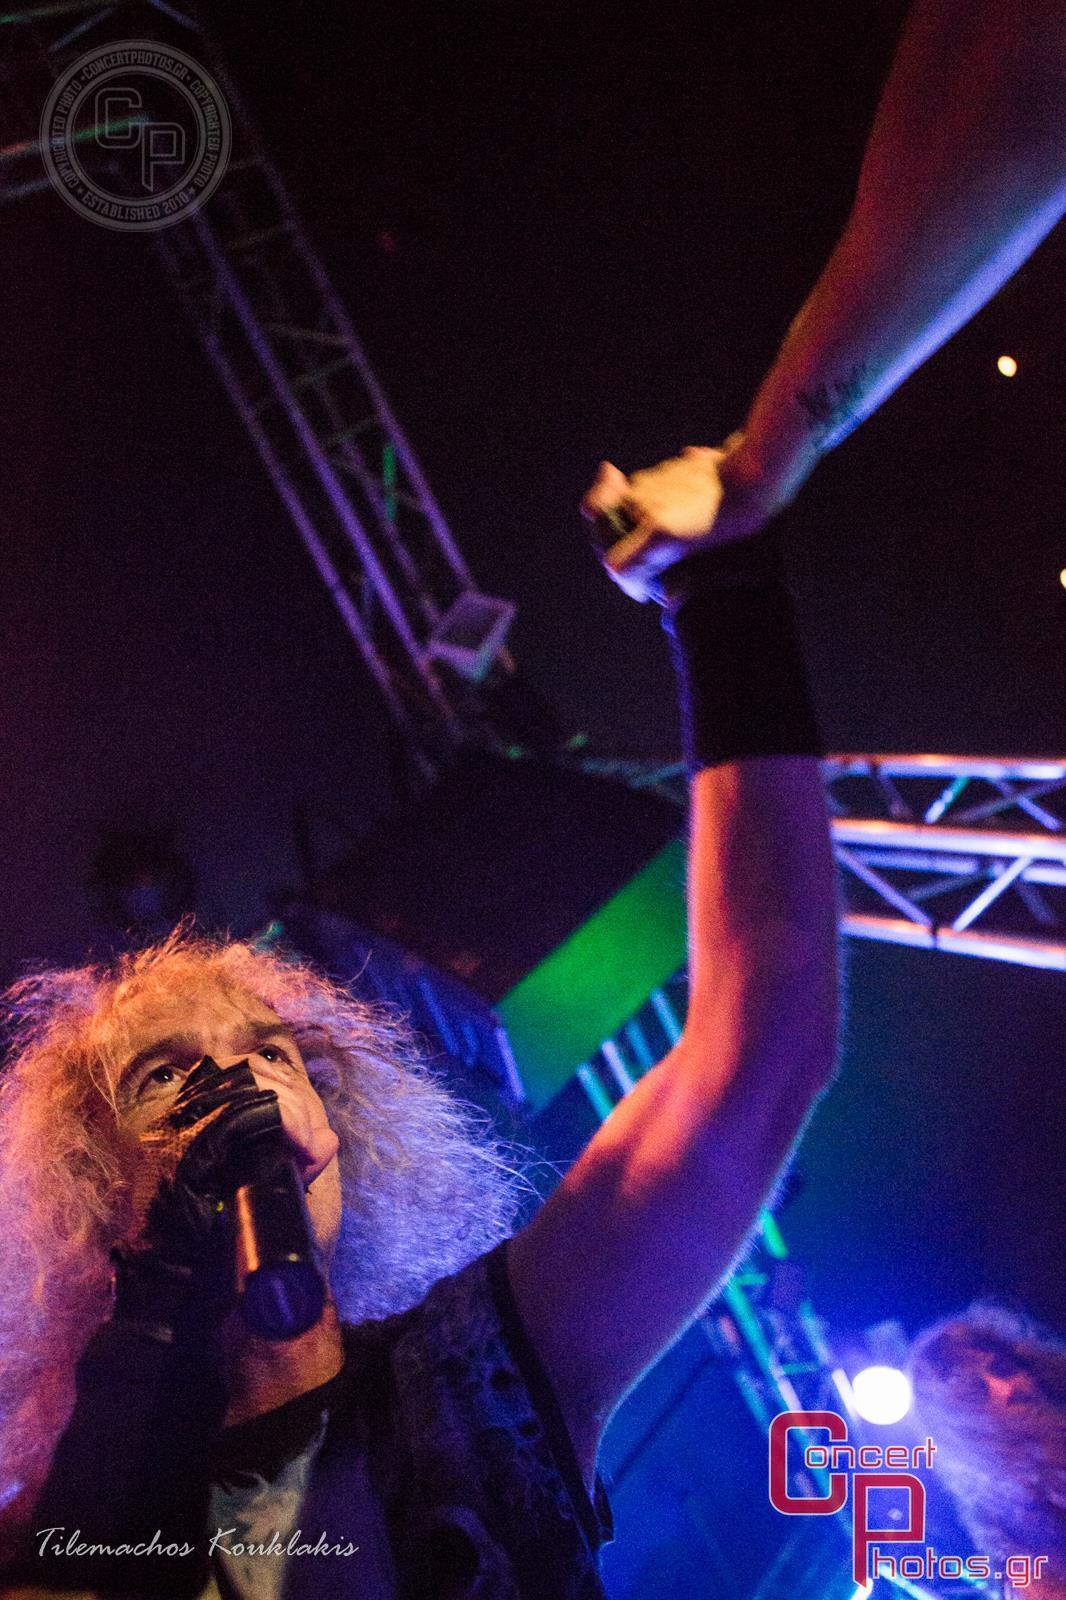 Grave Digger & Silent Rage -Grave Digger Silent Rage Kyttaro photographer:  - ConcertPhotos - 20140919_2221_57